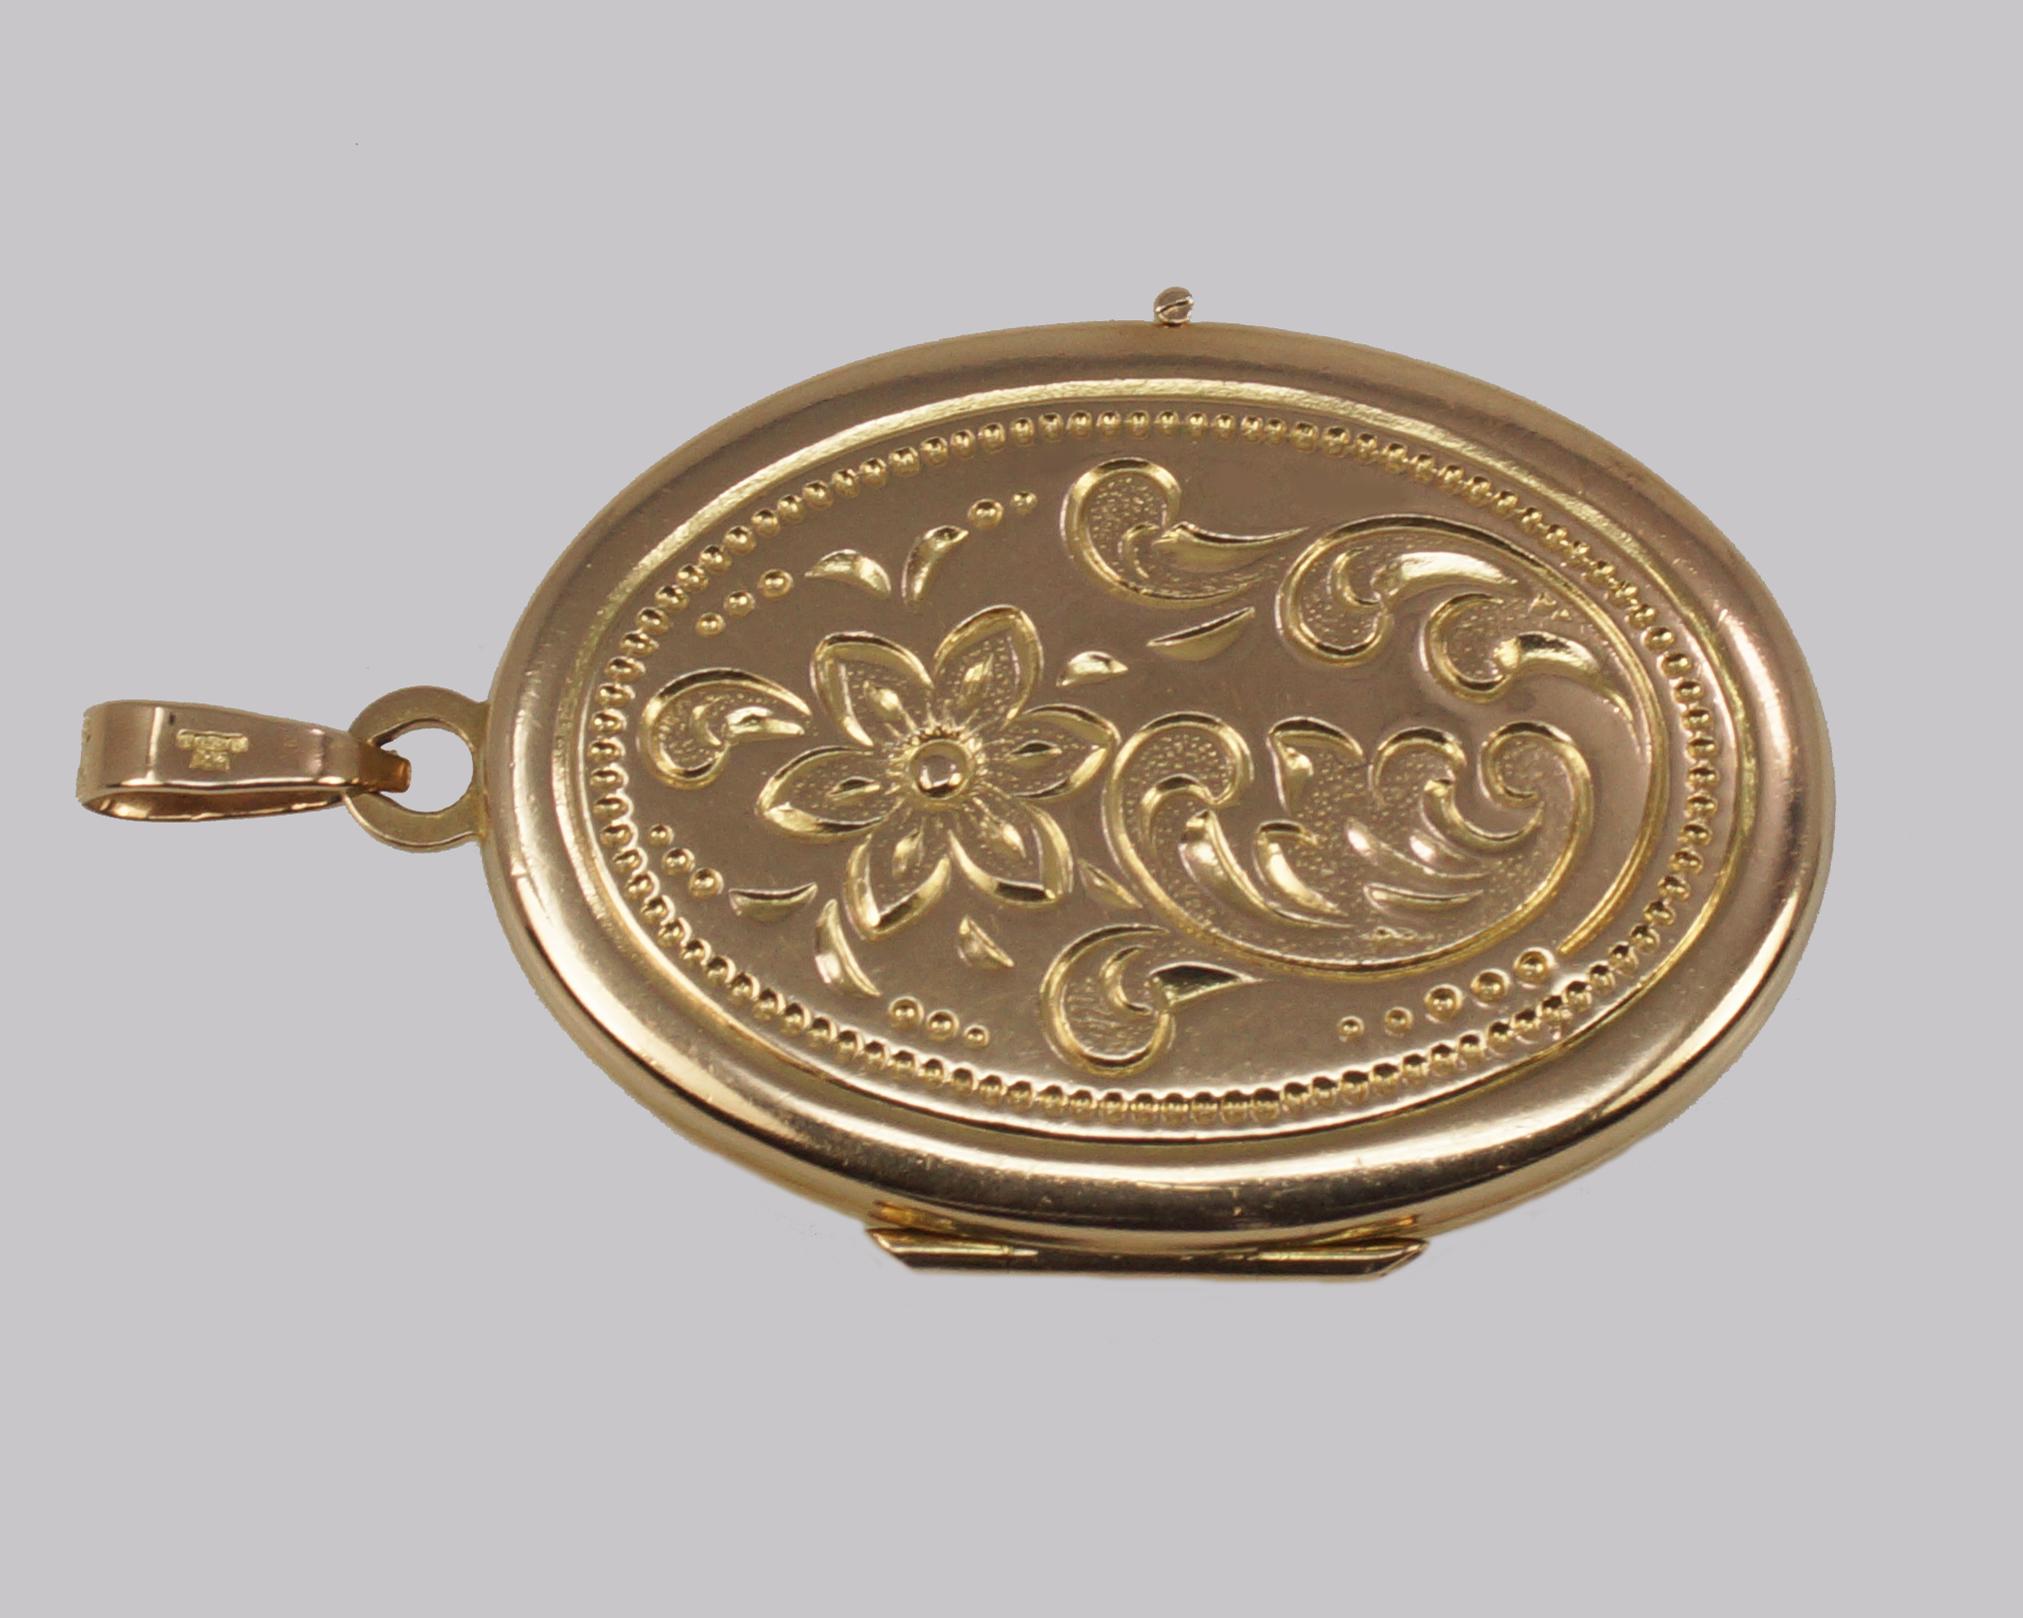 9ct Gold Floral Locket 1973